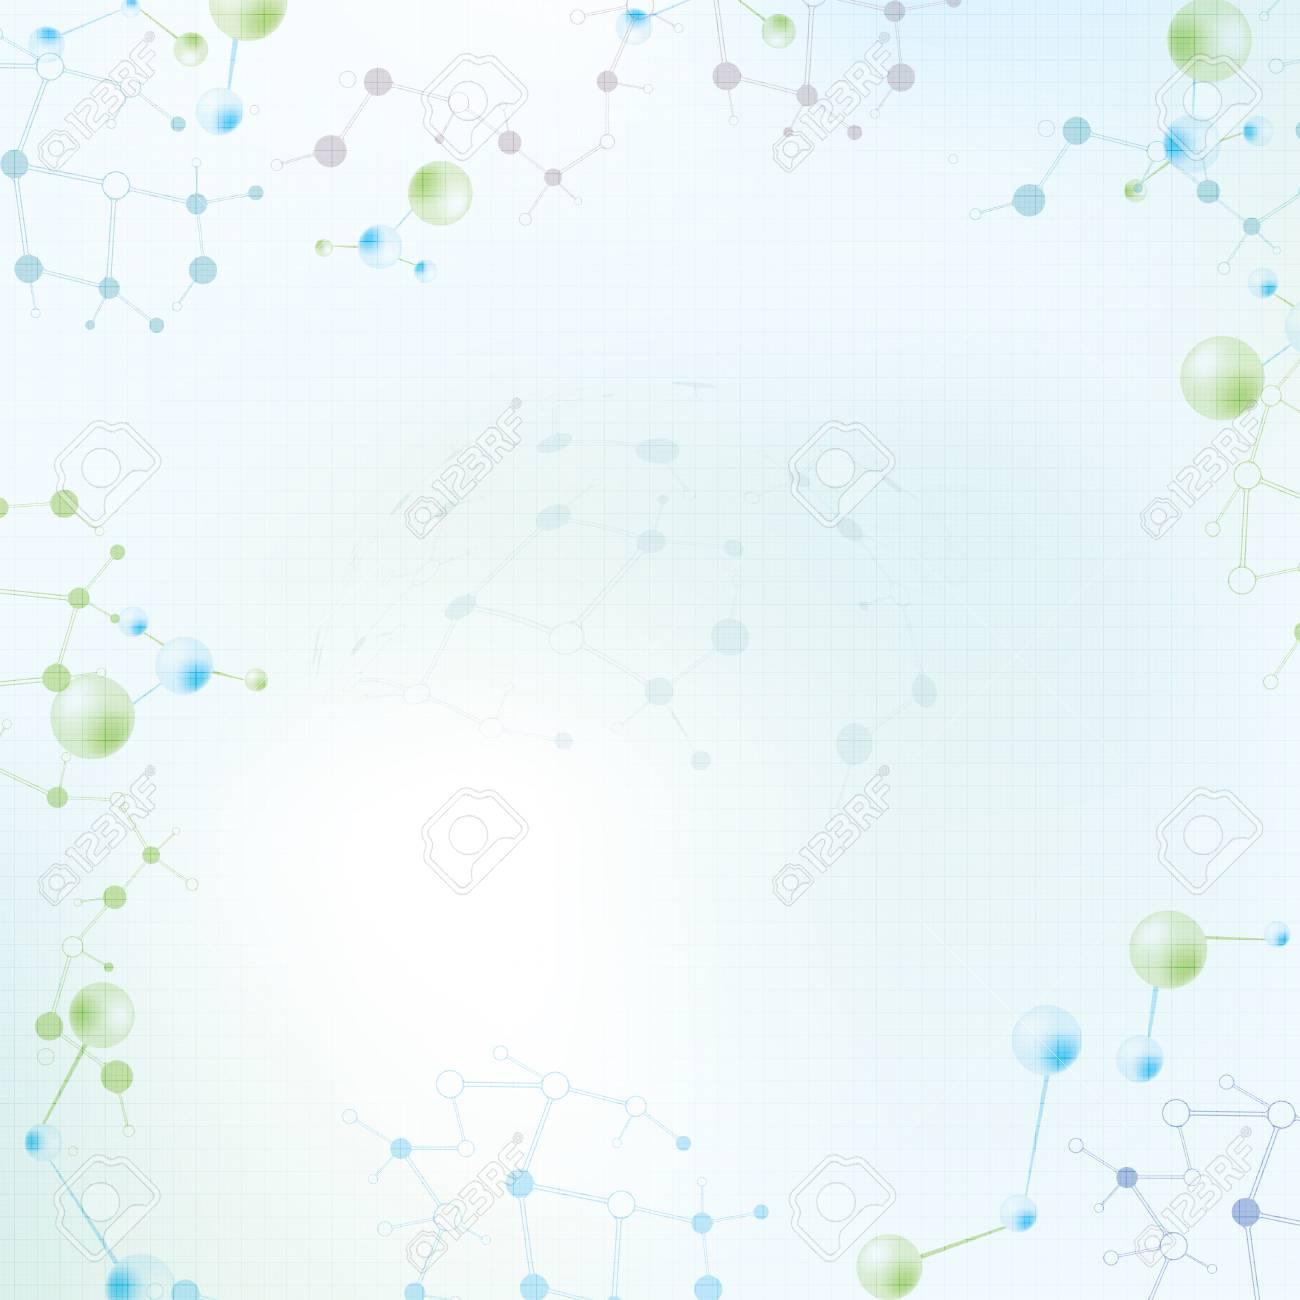 Abstract molecule background Stock Vector - 27455546